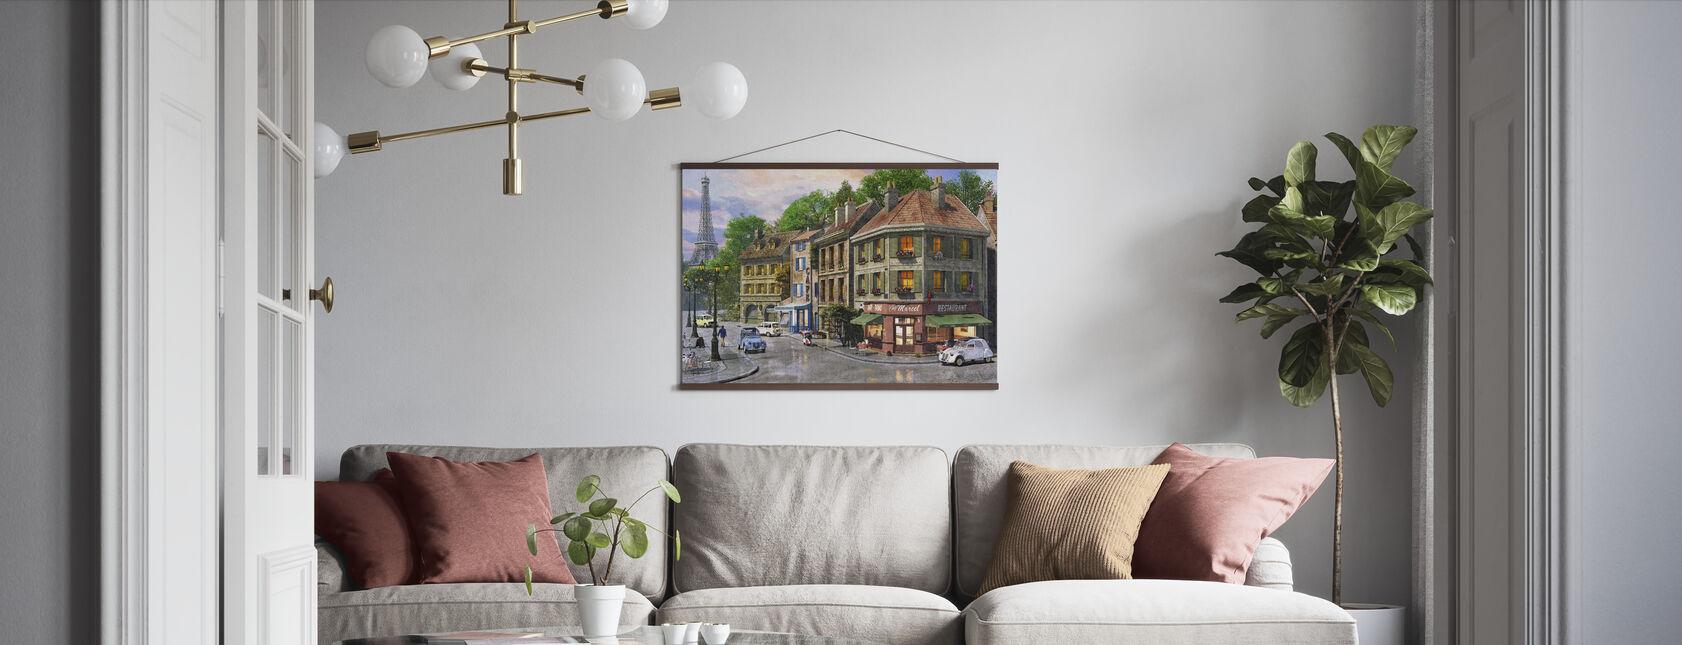 Paris gator - Poster - Vardagsrum